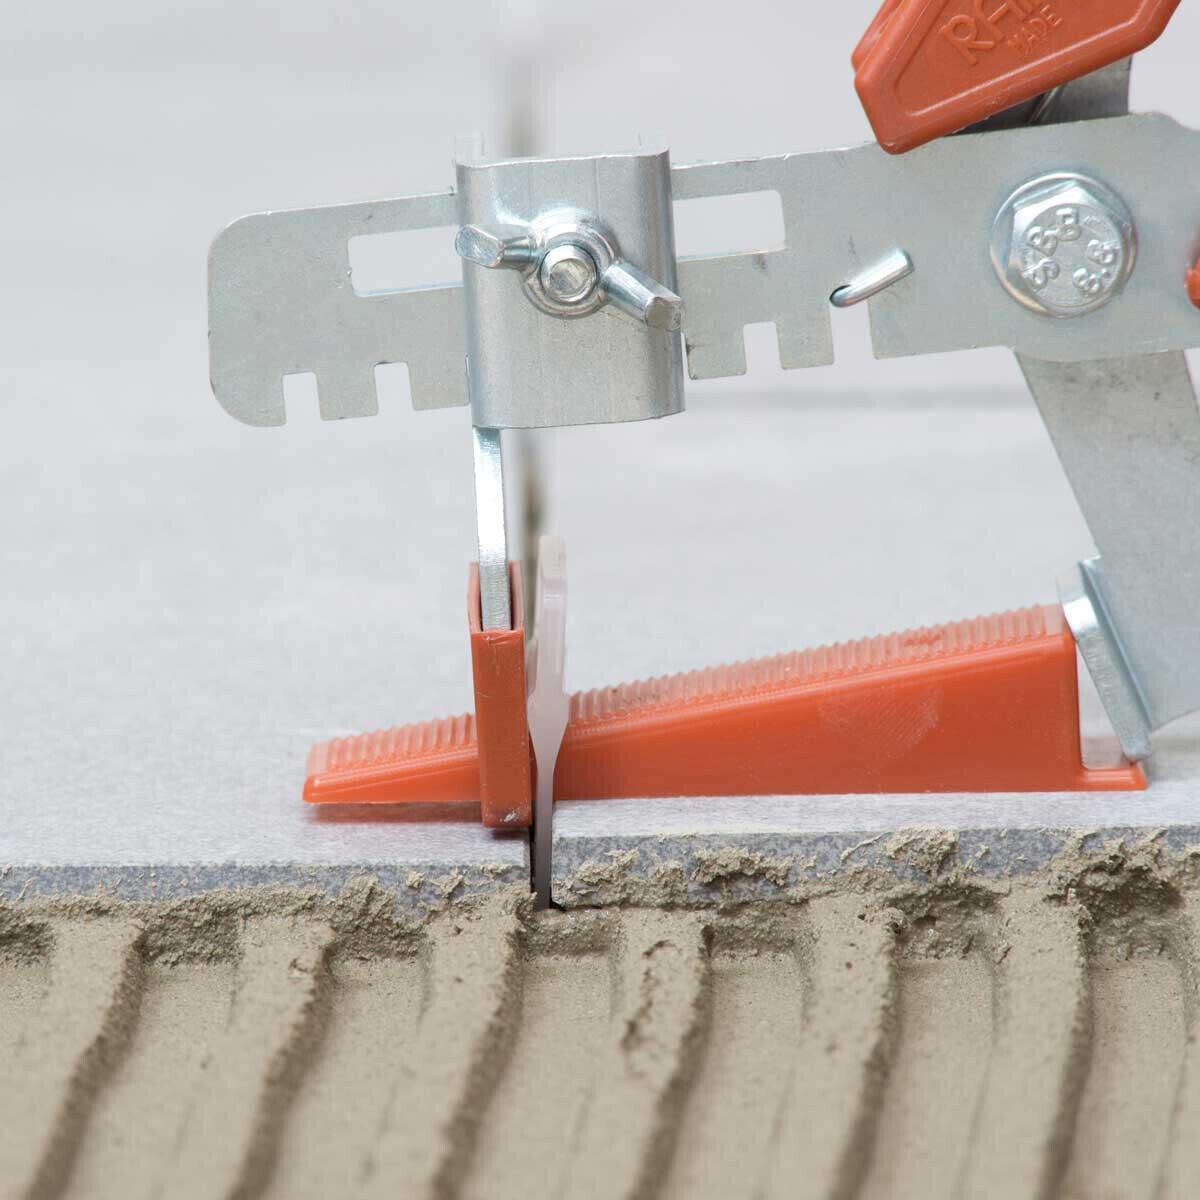 raimondi RLS Regular Clear Clips floor plier wedge